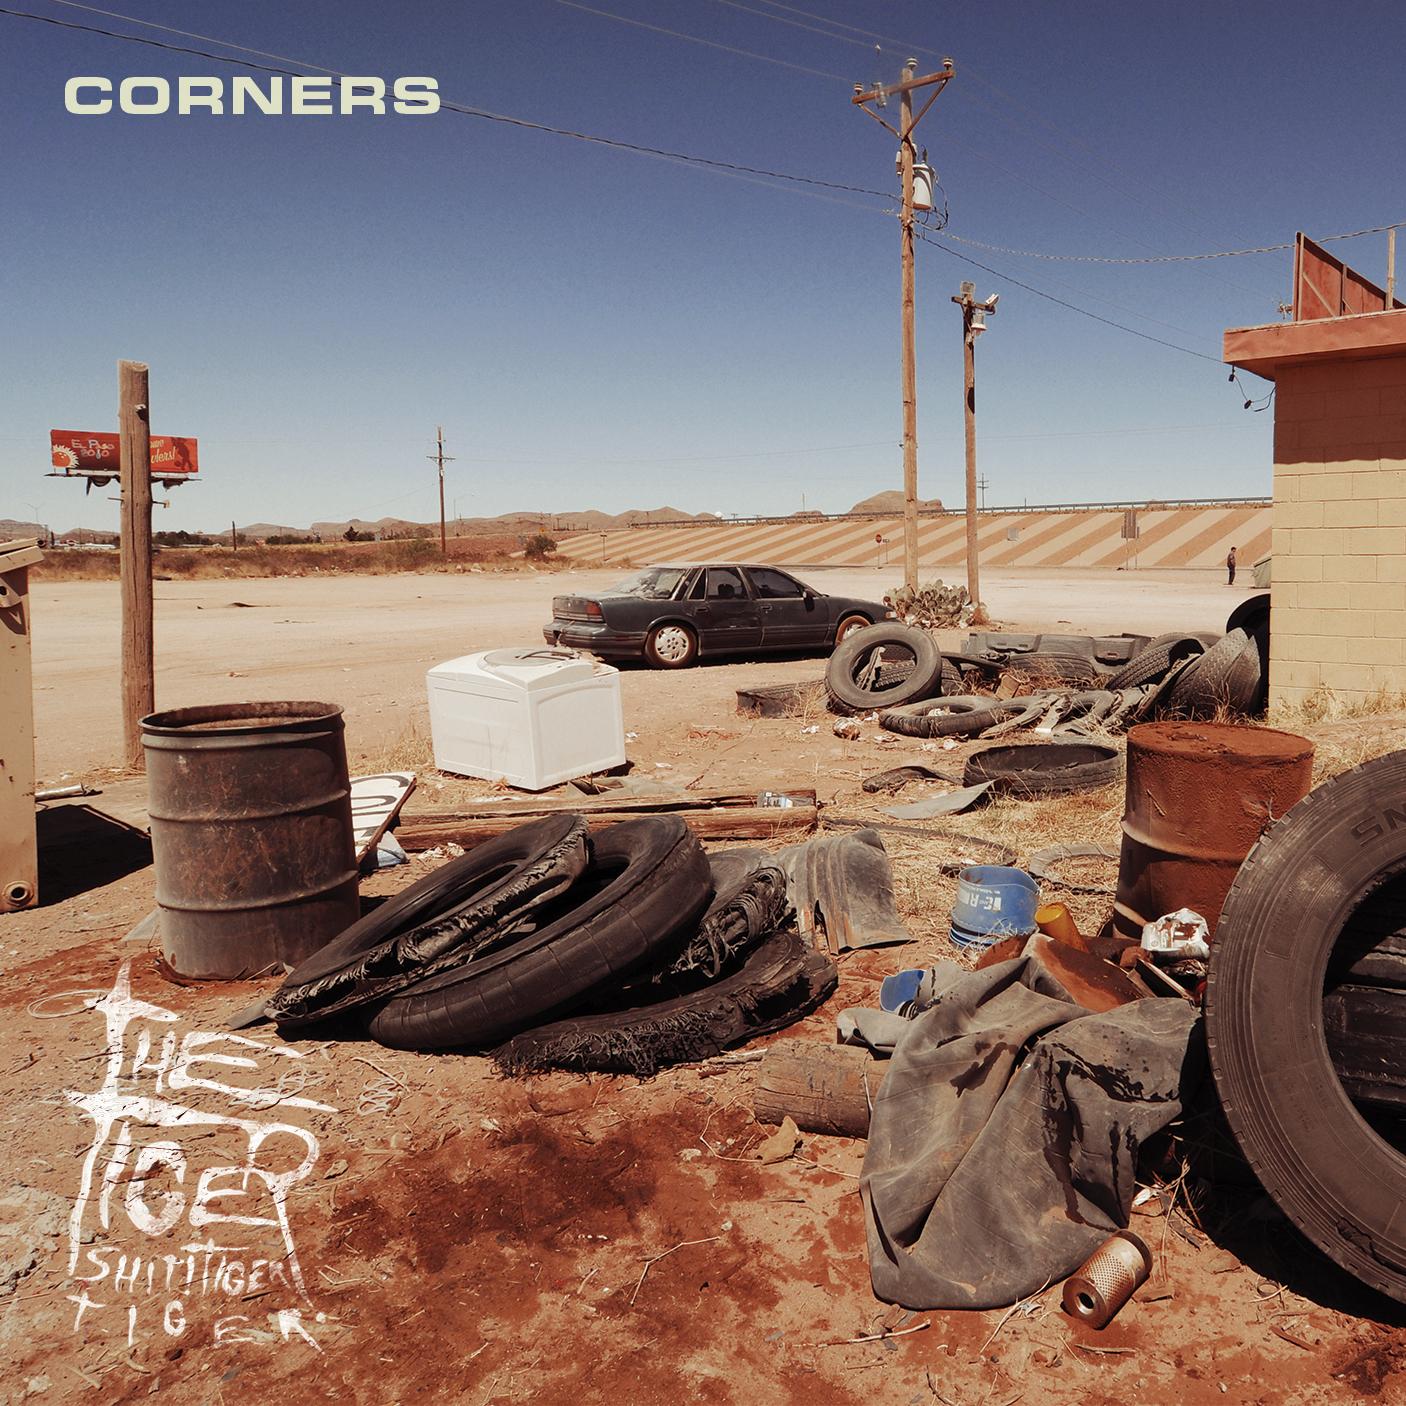 Tiger! Shit! Tiger! Tiger! - Corners CD/LP